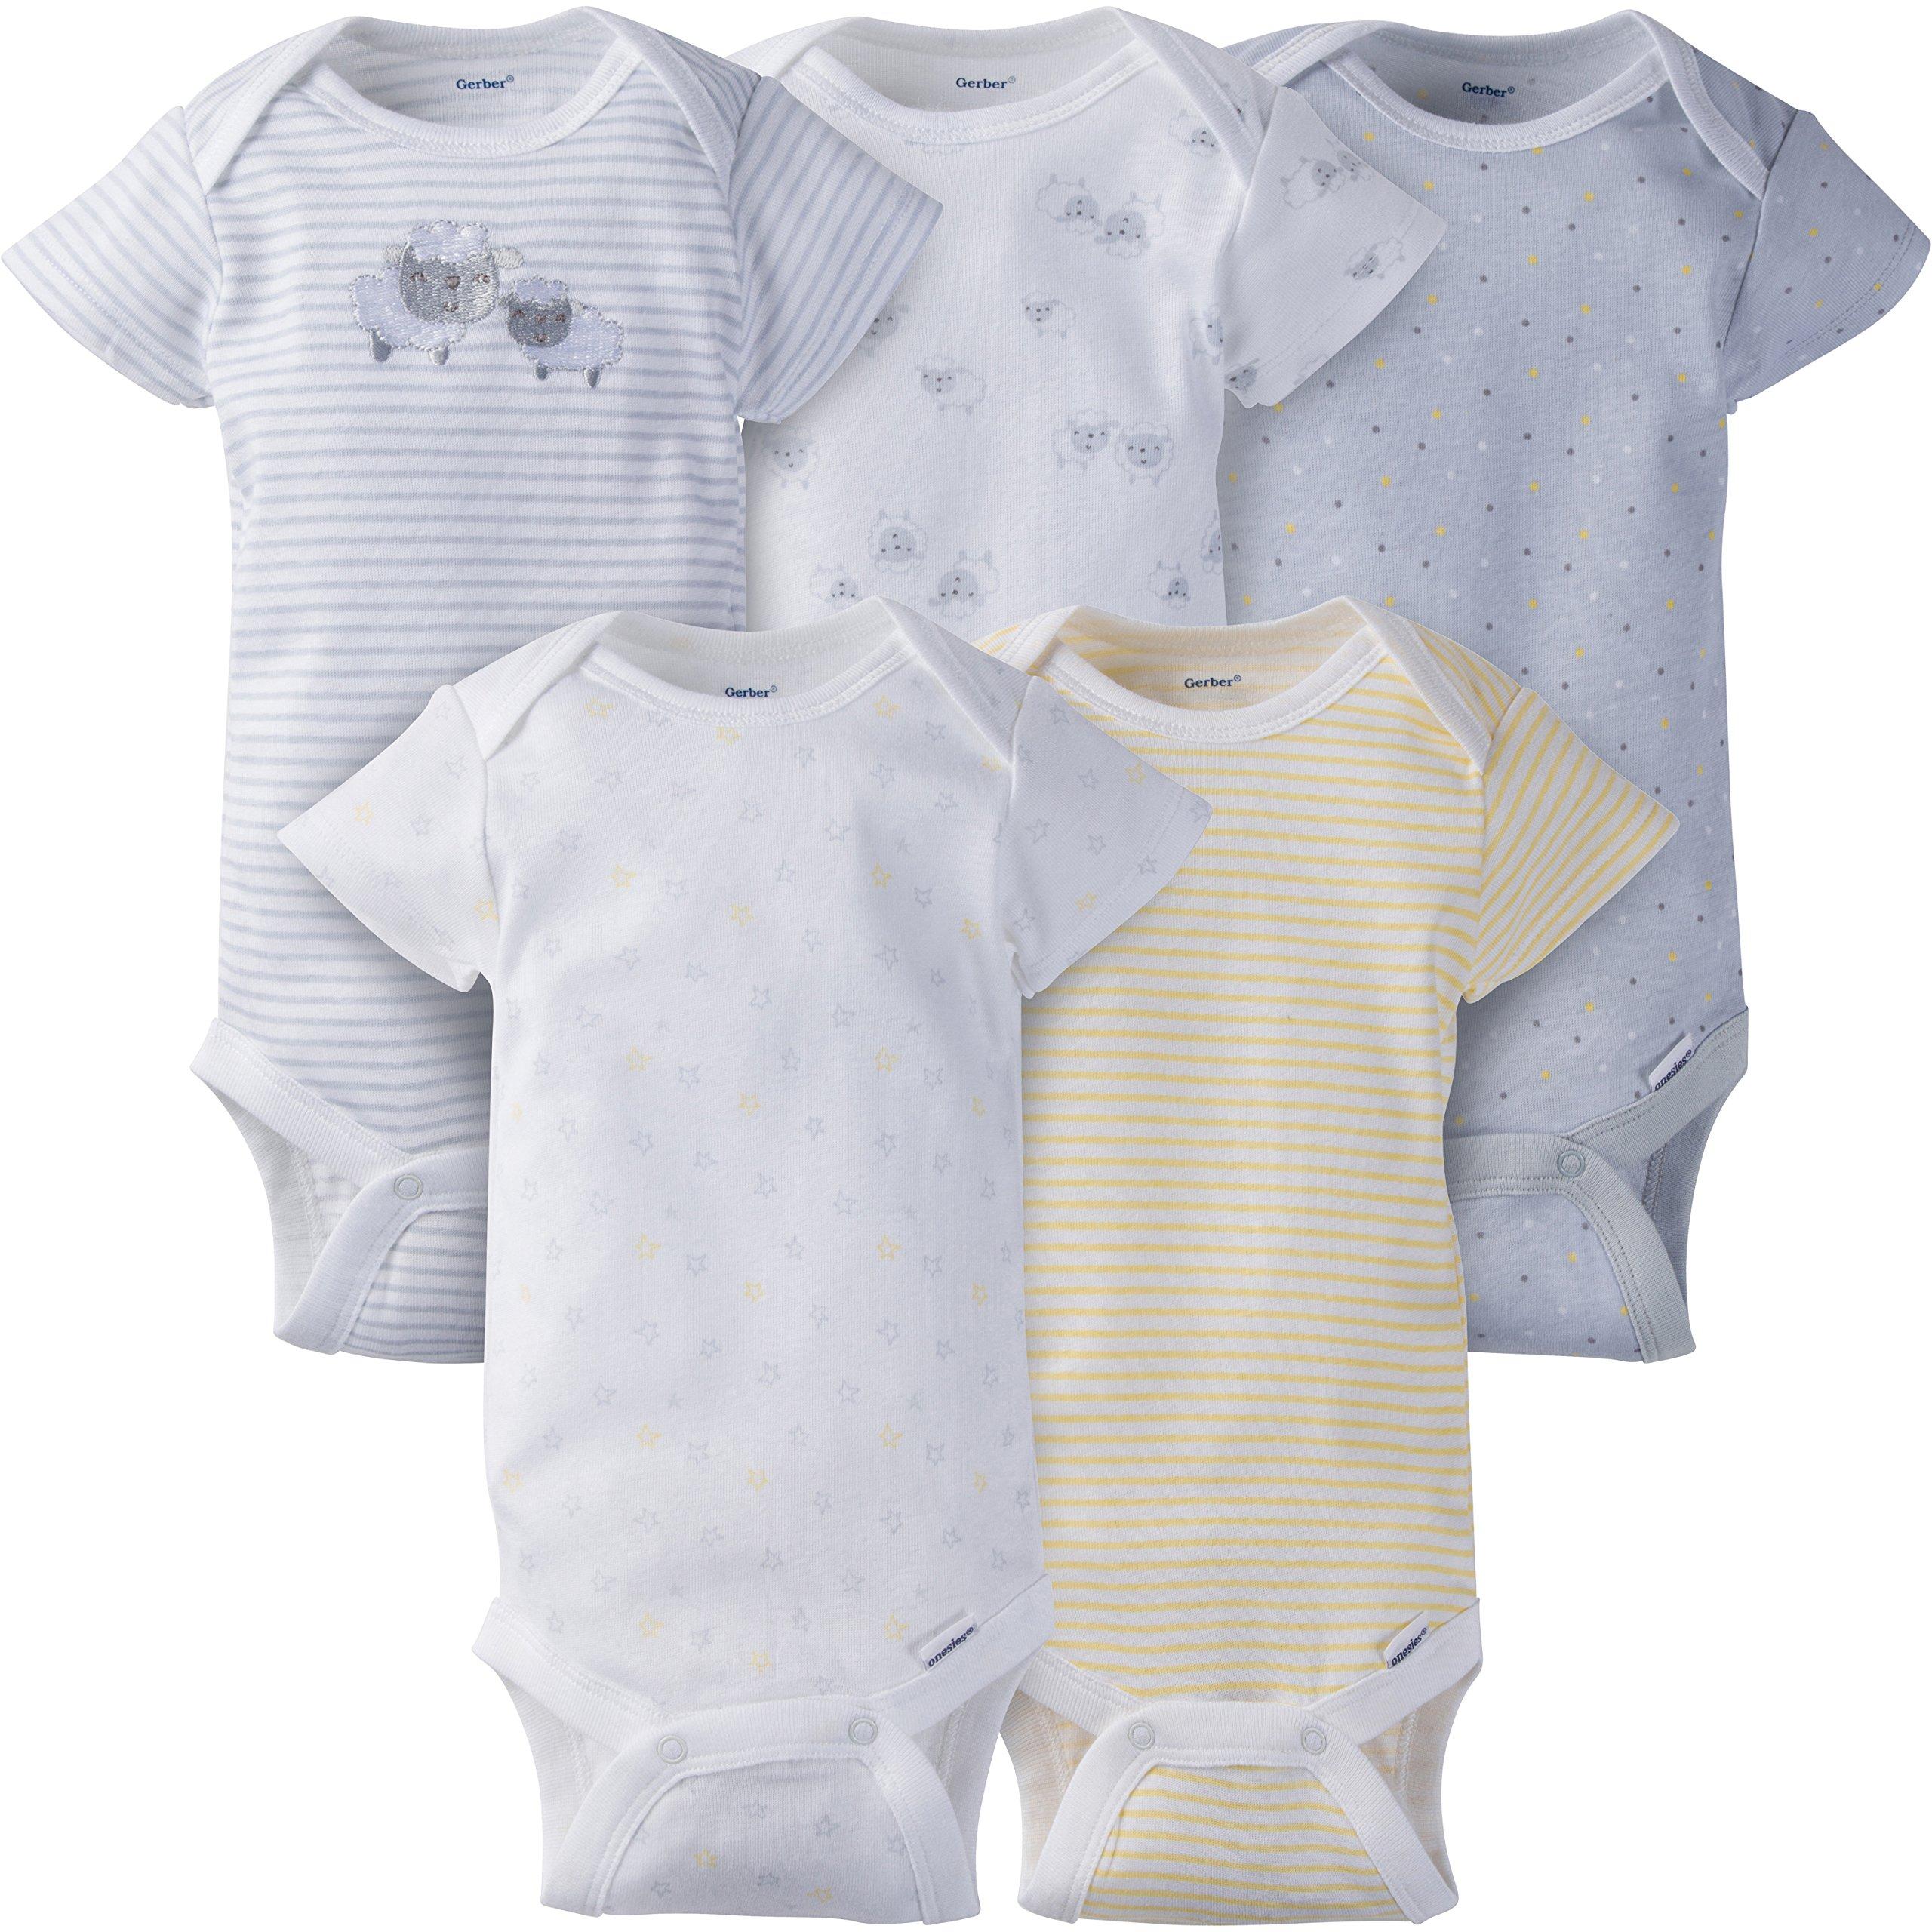 Gerber Baby 5-Pack Short-Sleeve Onesies, Little Lamb, 3-6 Months